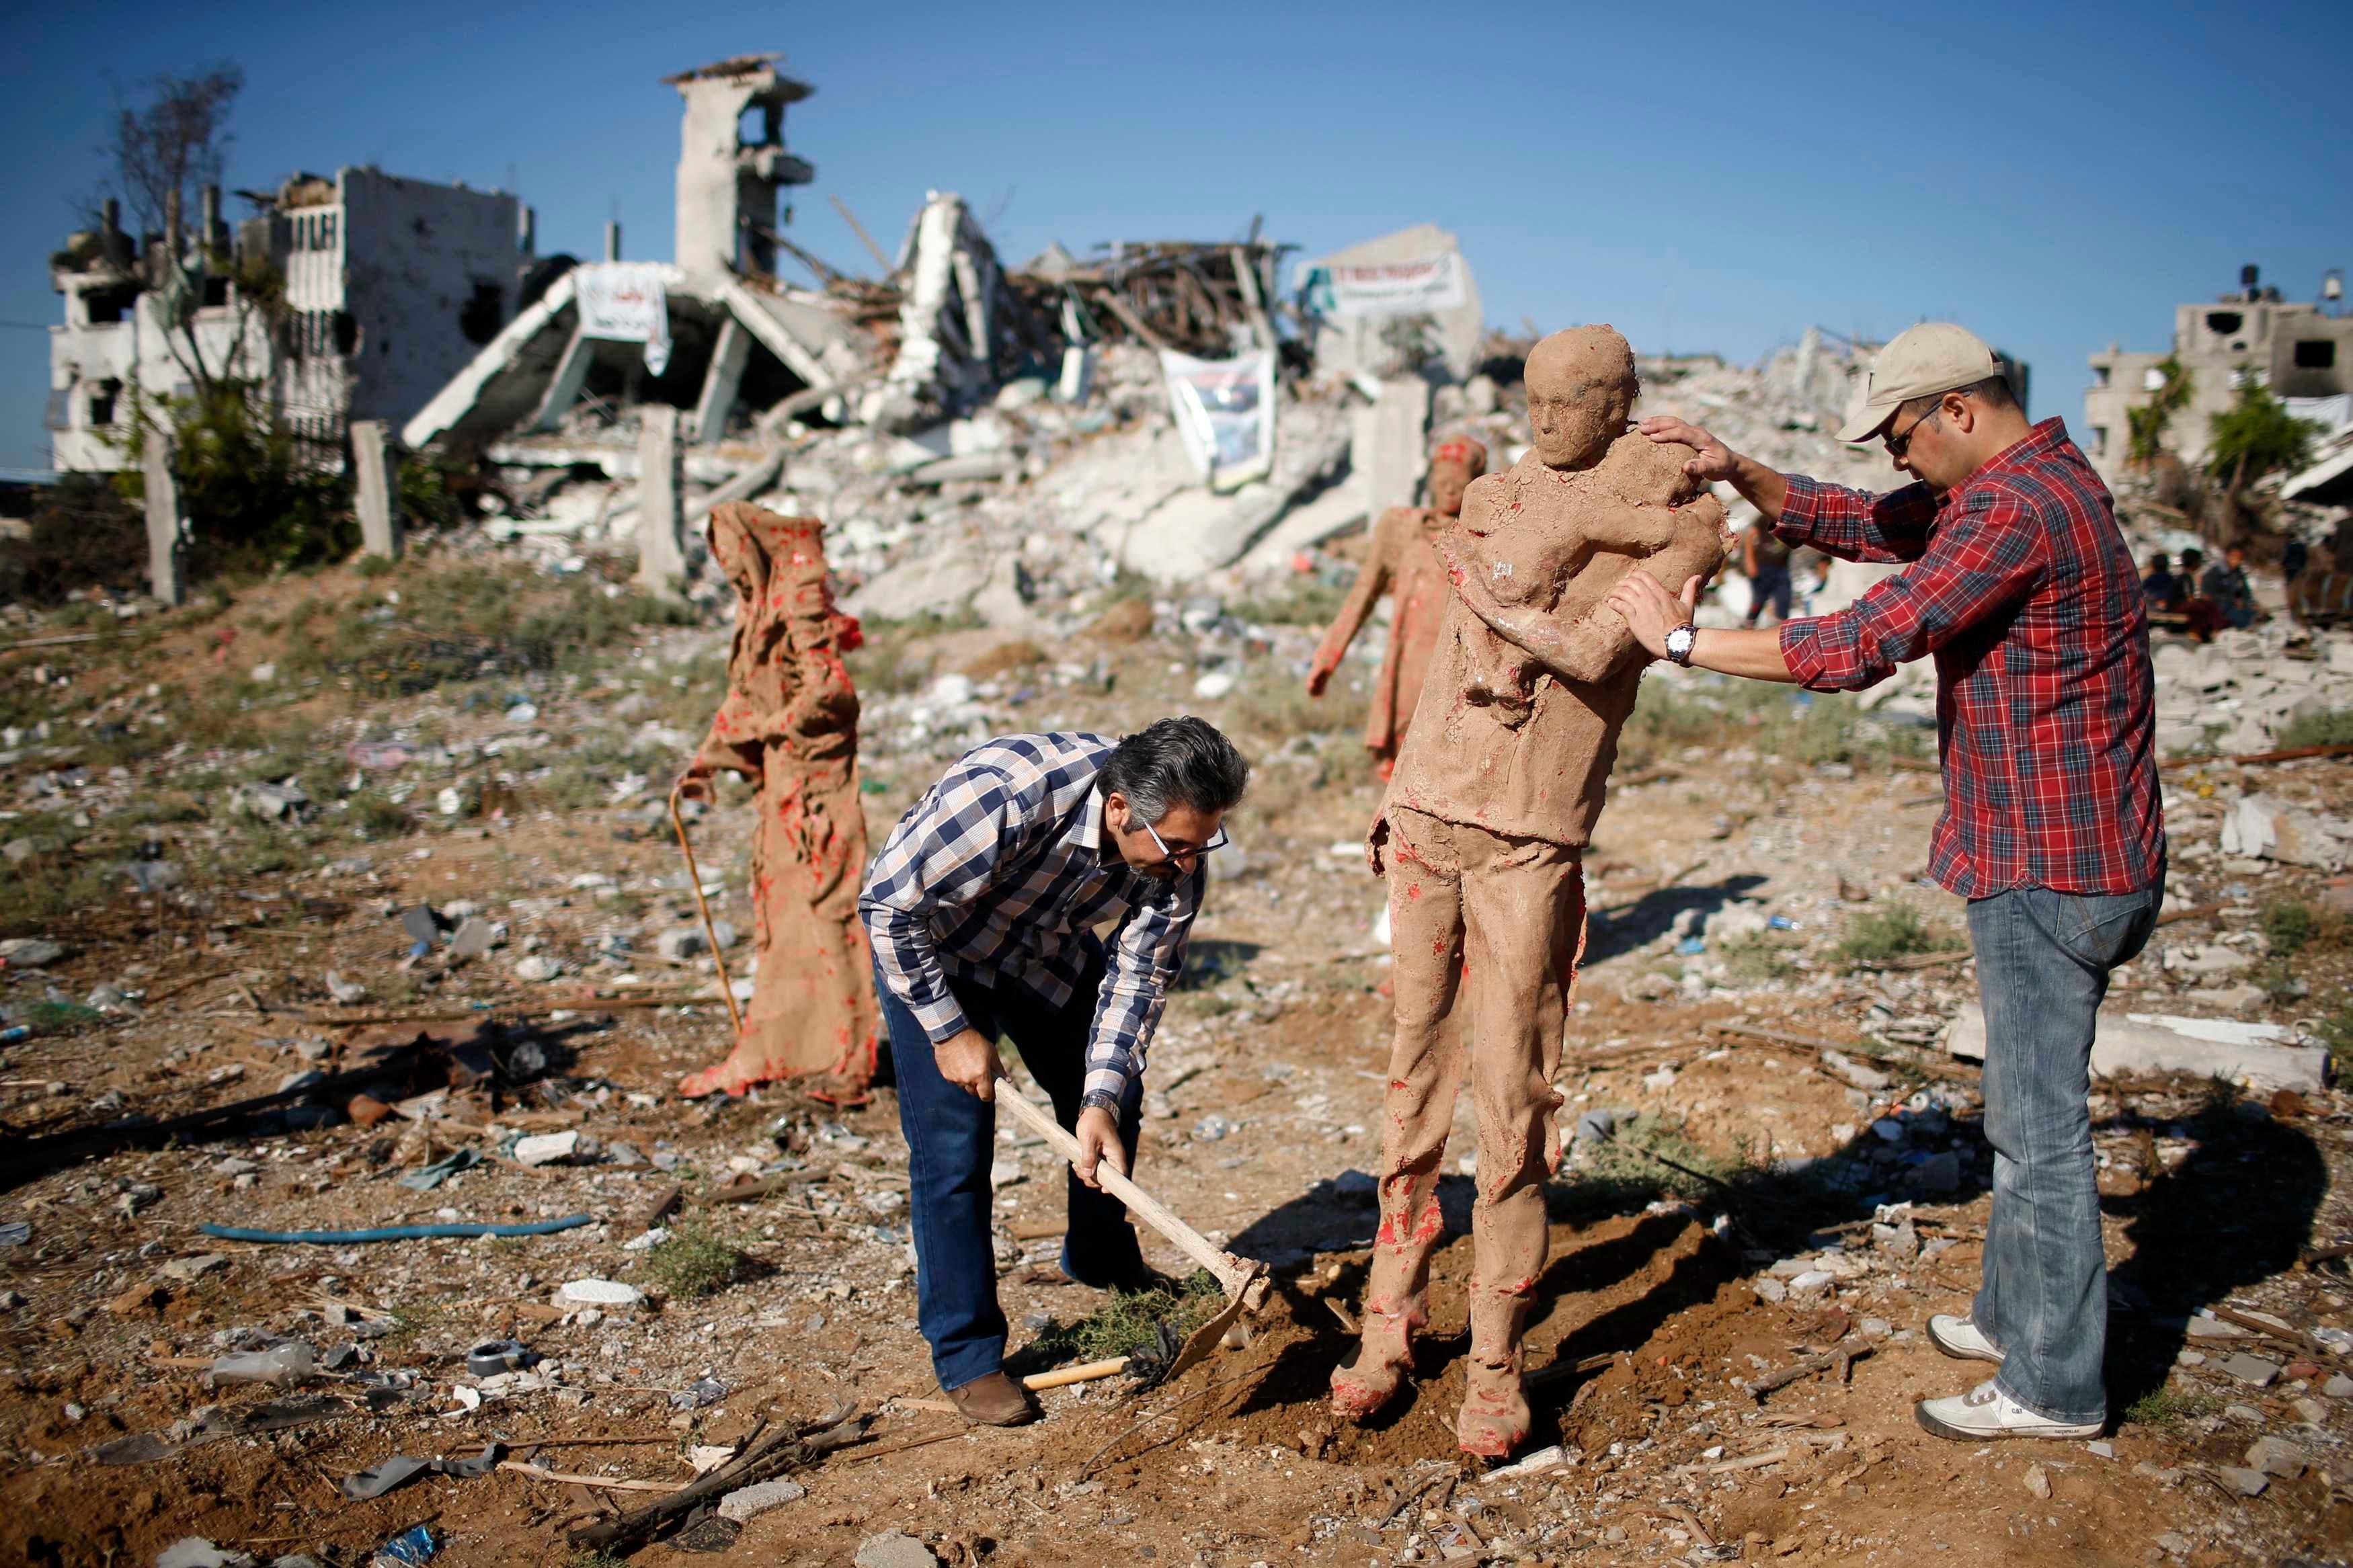 Stuck in the rubble: Gaza artist deploys frozen human